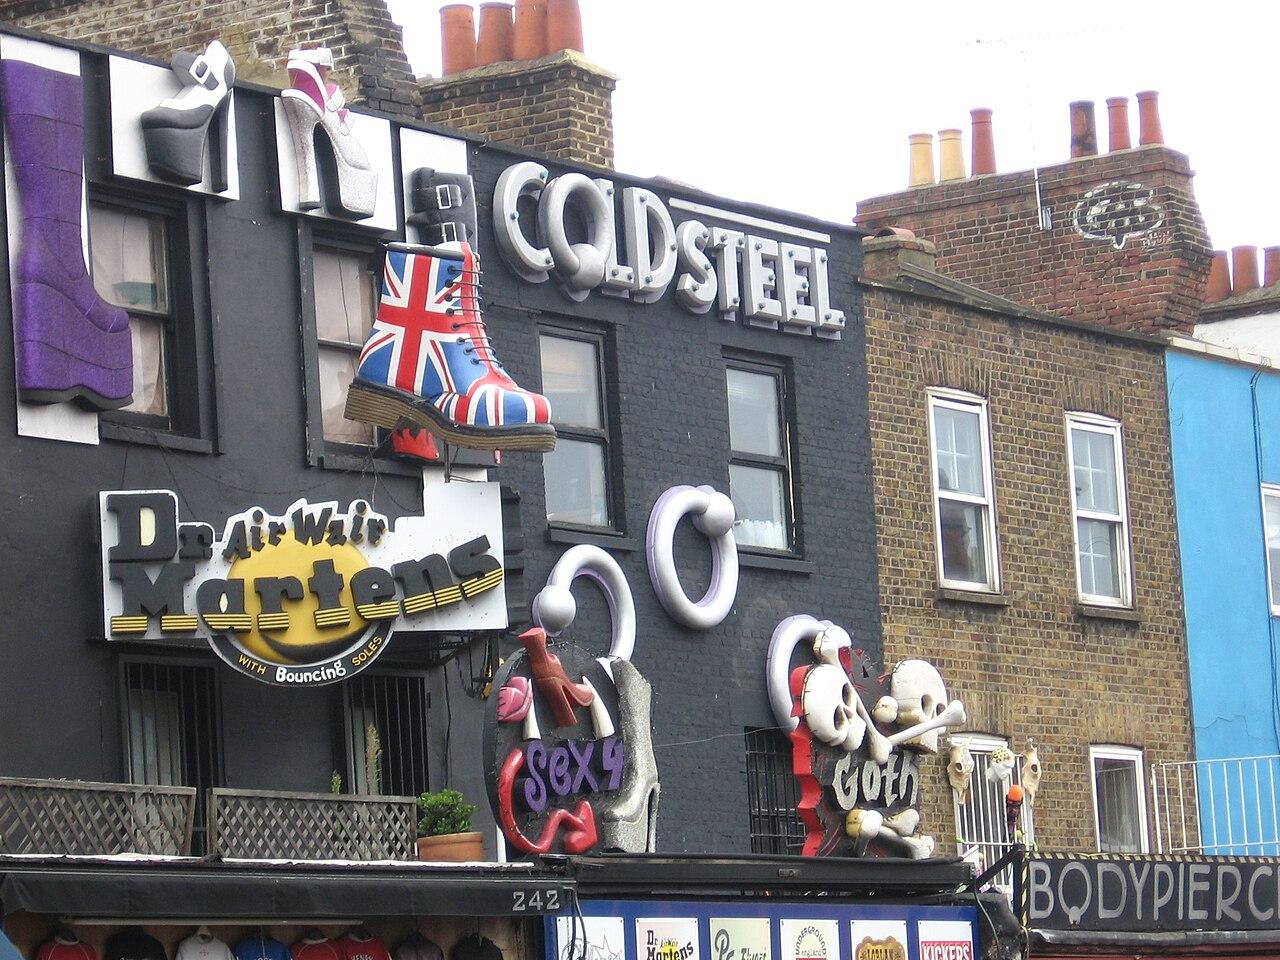 Dating in Camden & Online London Singles - Find a Date in Camden